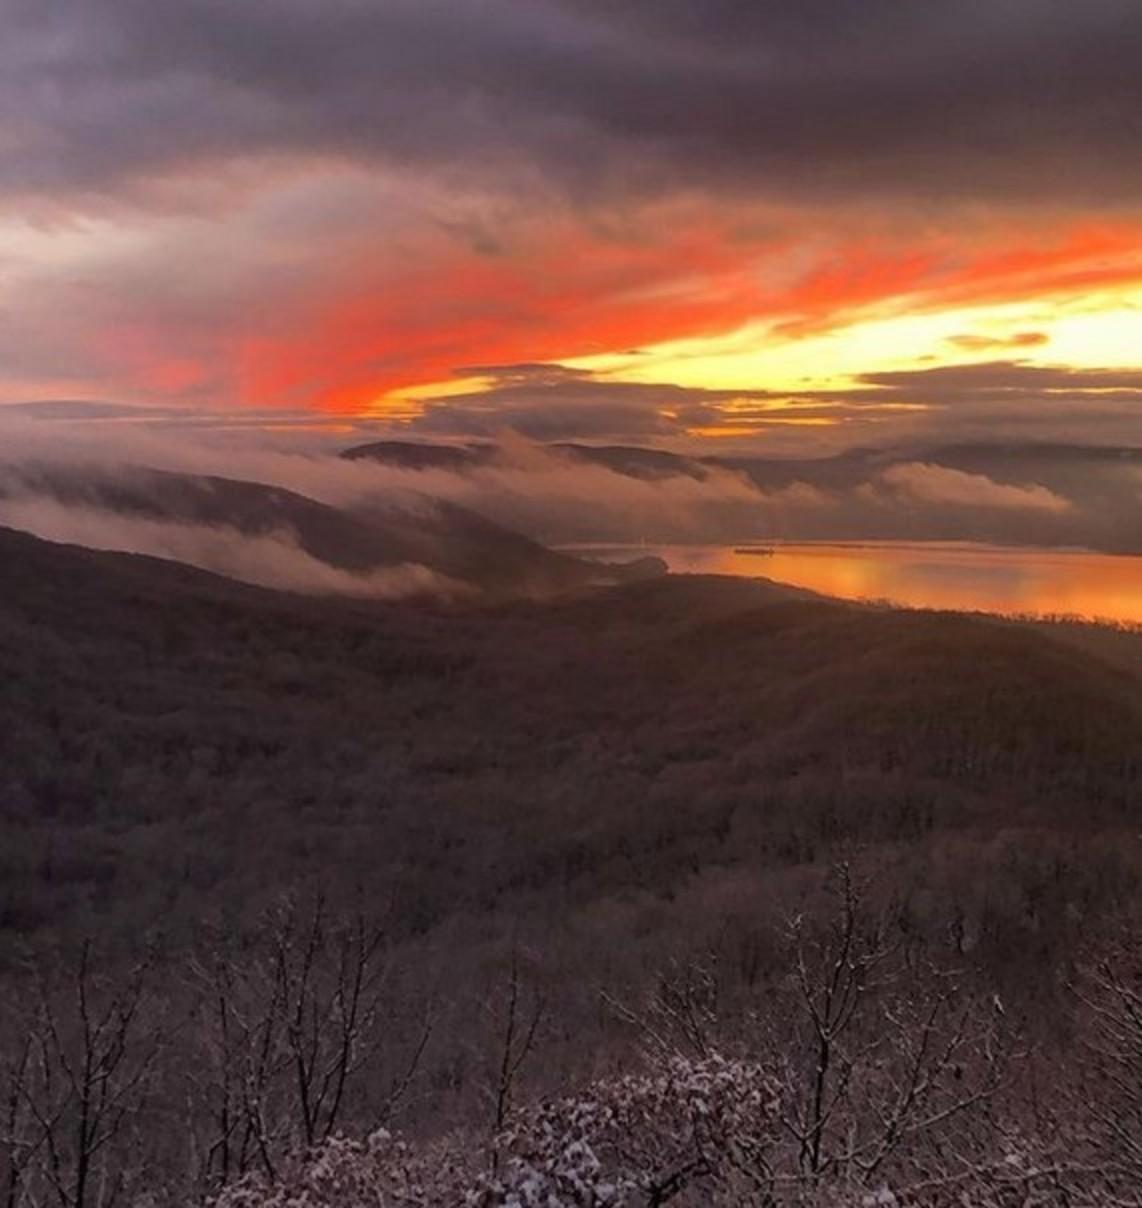 Hudson Valley Hikes on Instagram